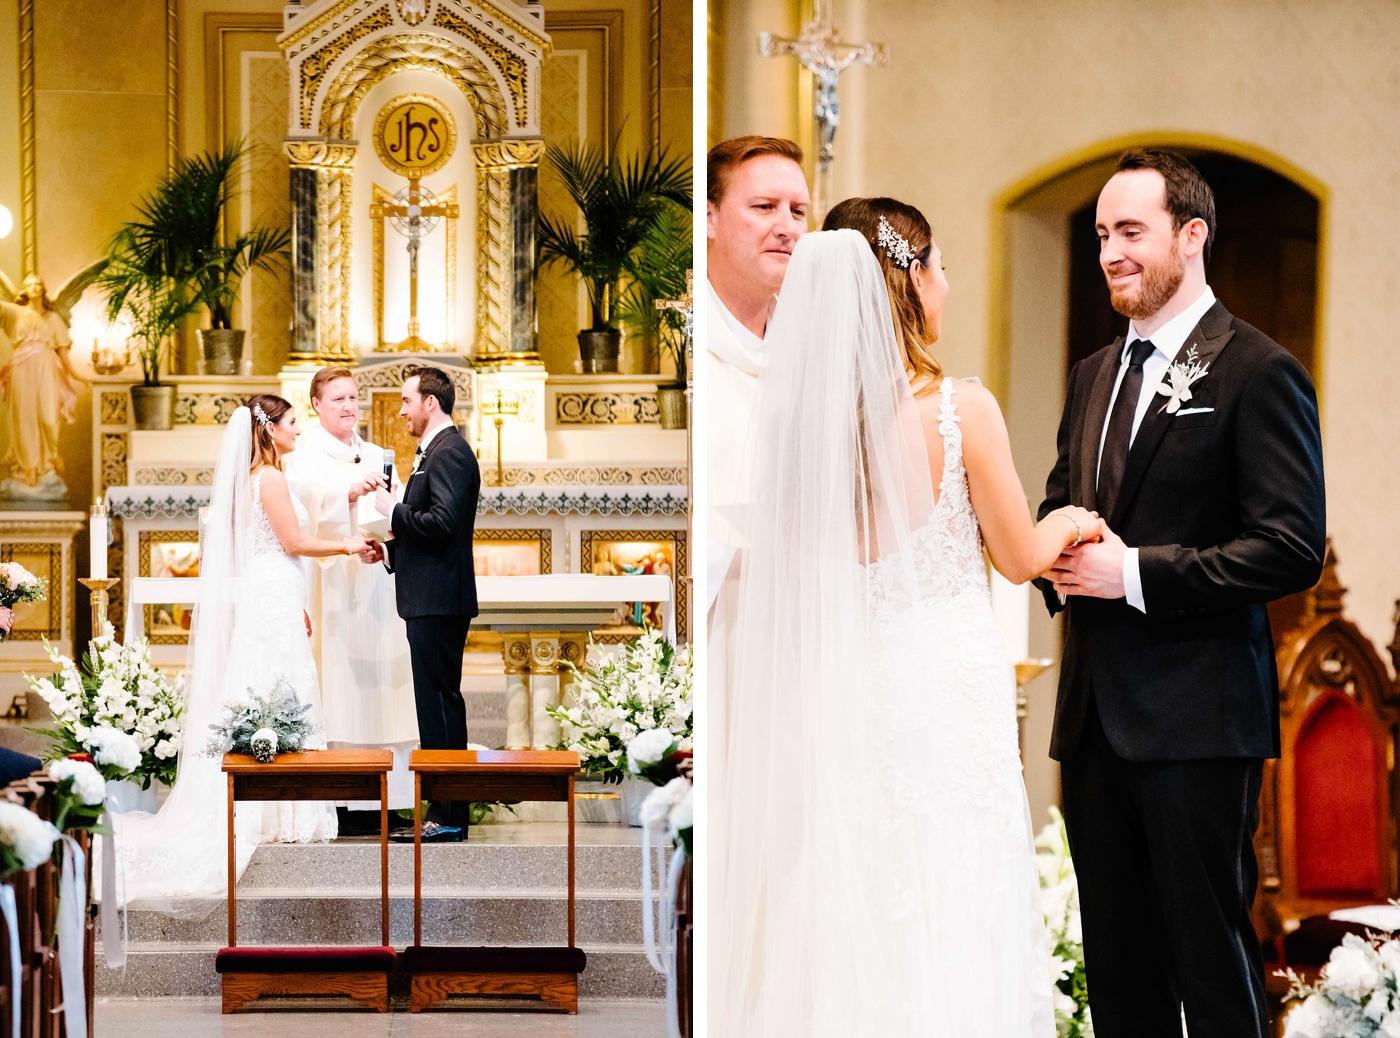 chicago-fine-art-wedding-photography-duncan38